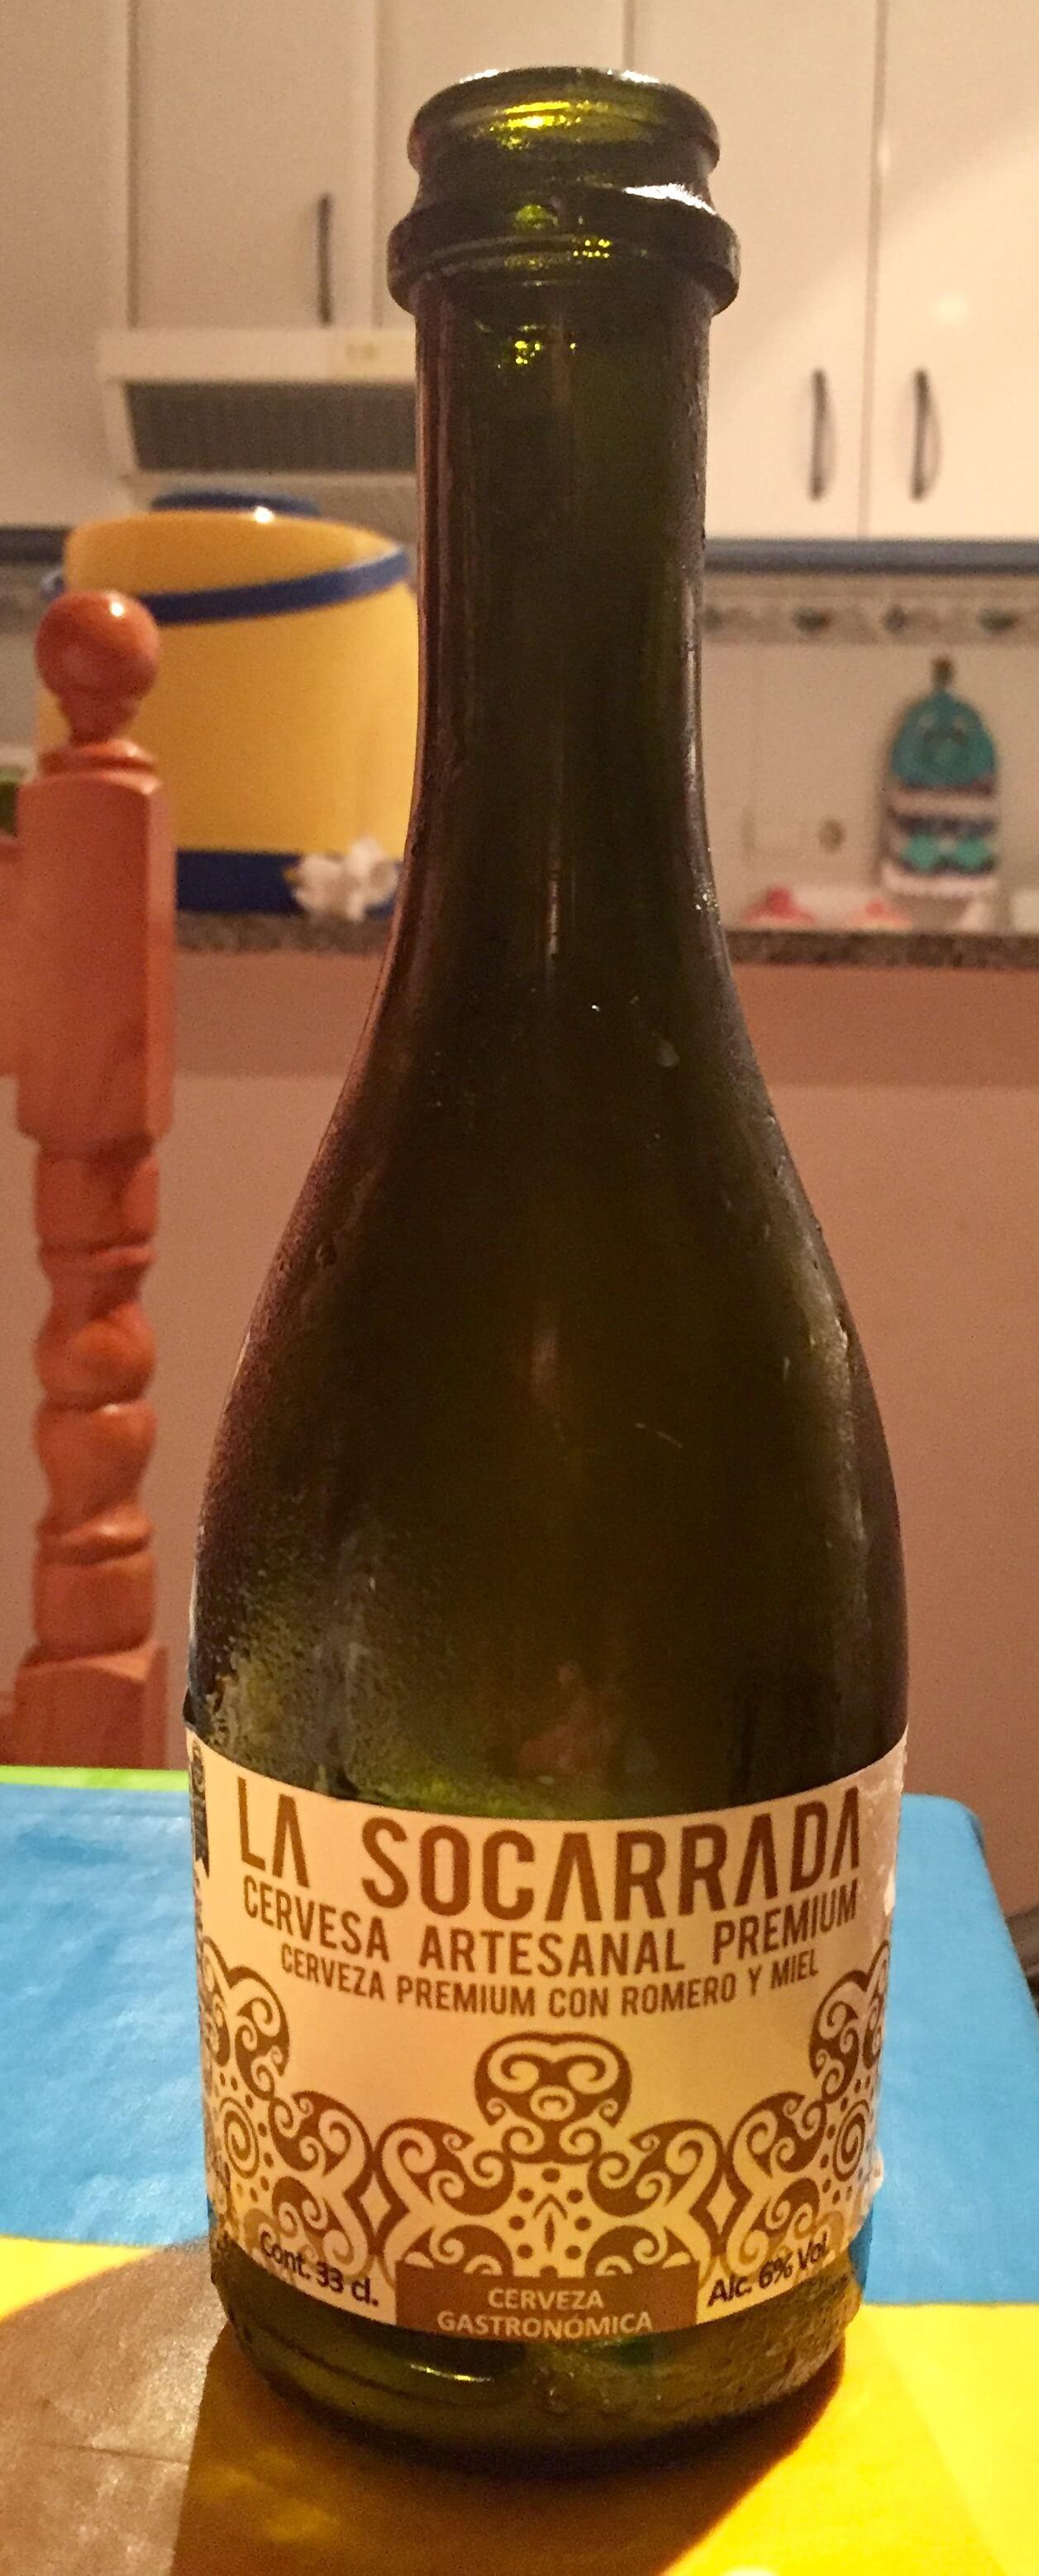 cerveza artesanal la socarrada-premium romero miel